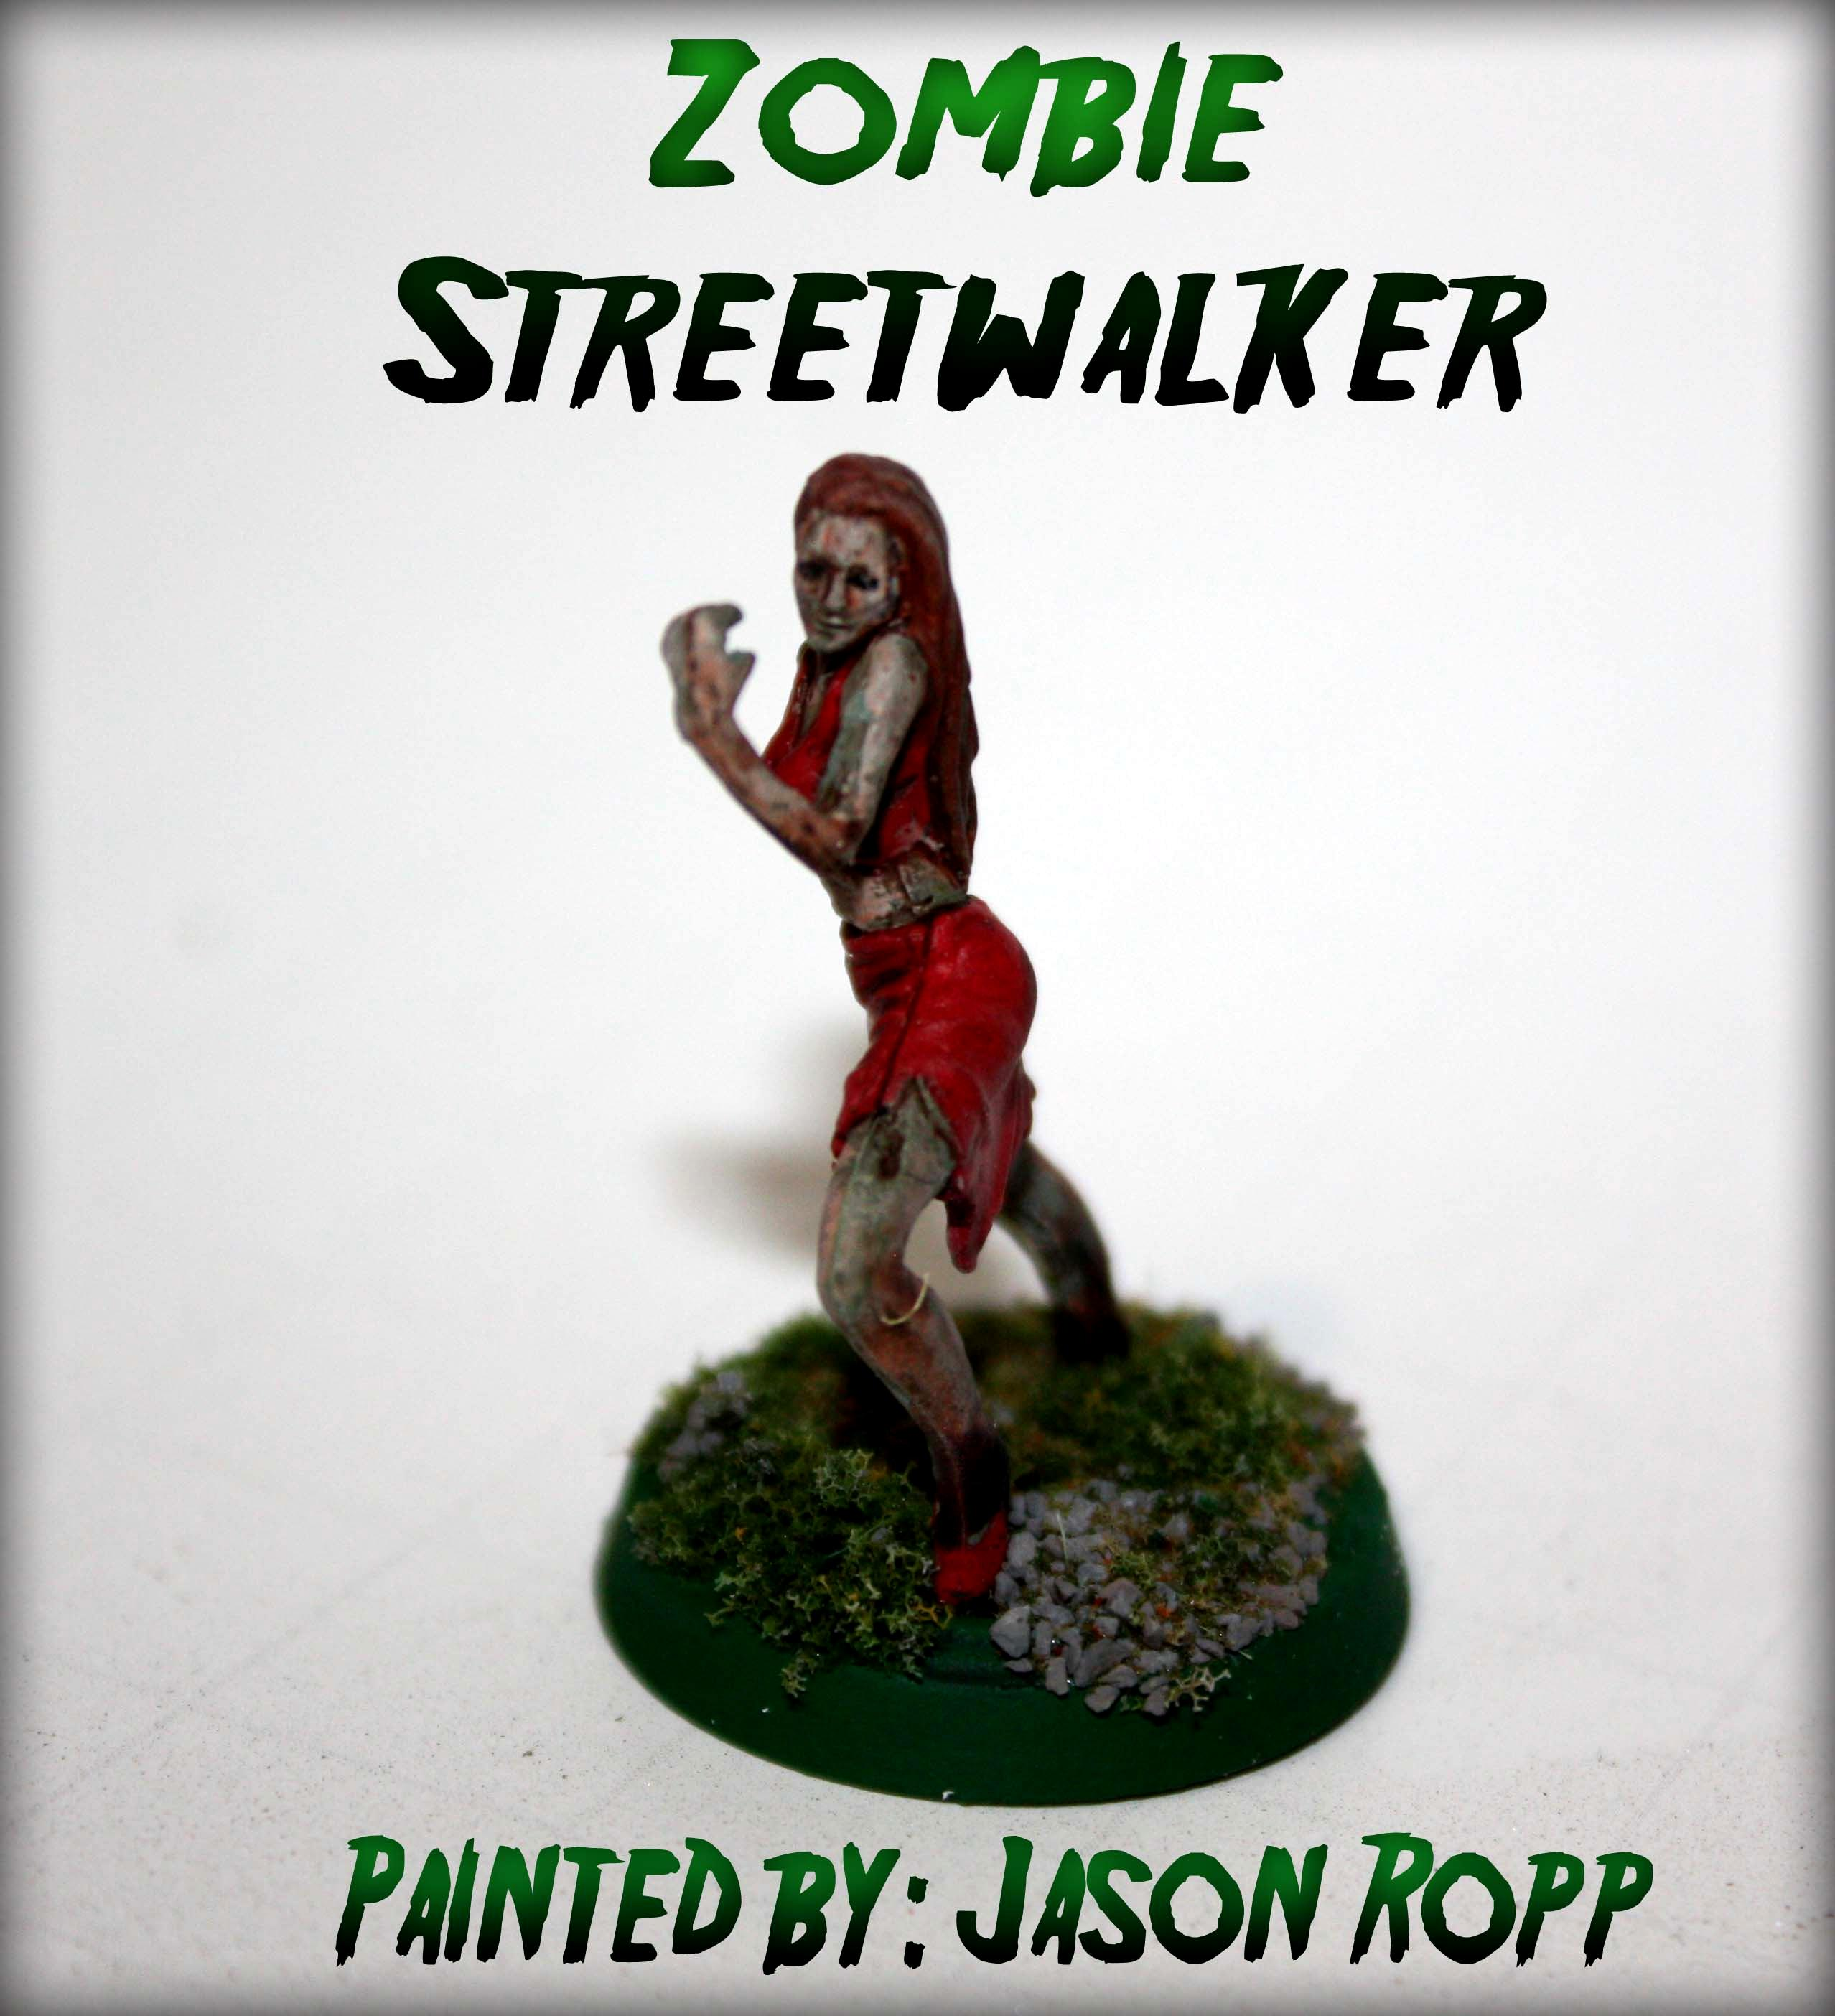 Custom, Freddy, Heroclix, Horrorclix, Horrors, Jason, Killers, Kruger, Leatherface, Miniatures, Tabletop, Voorhees, Wargame, Wargamer, Zombie